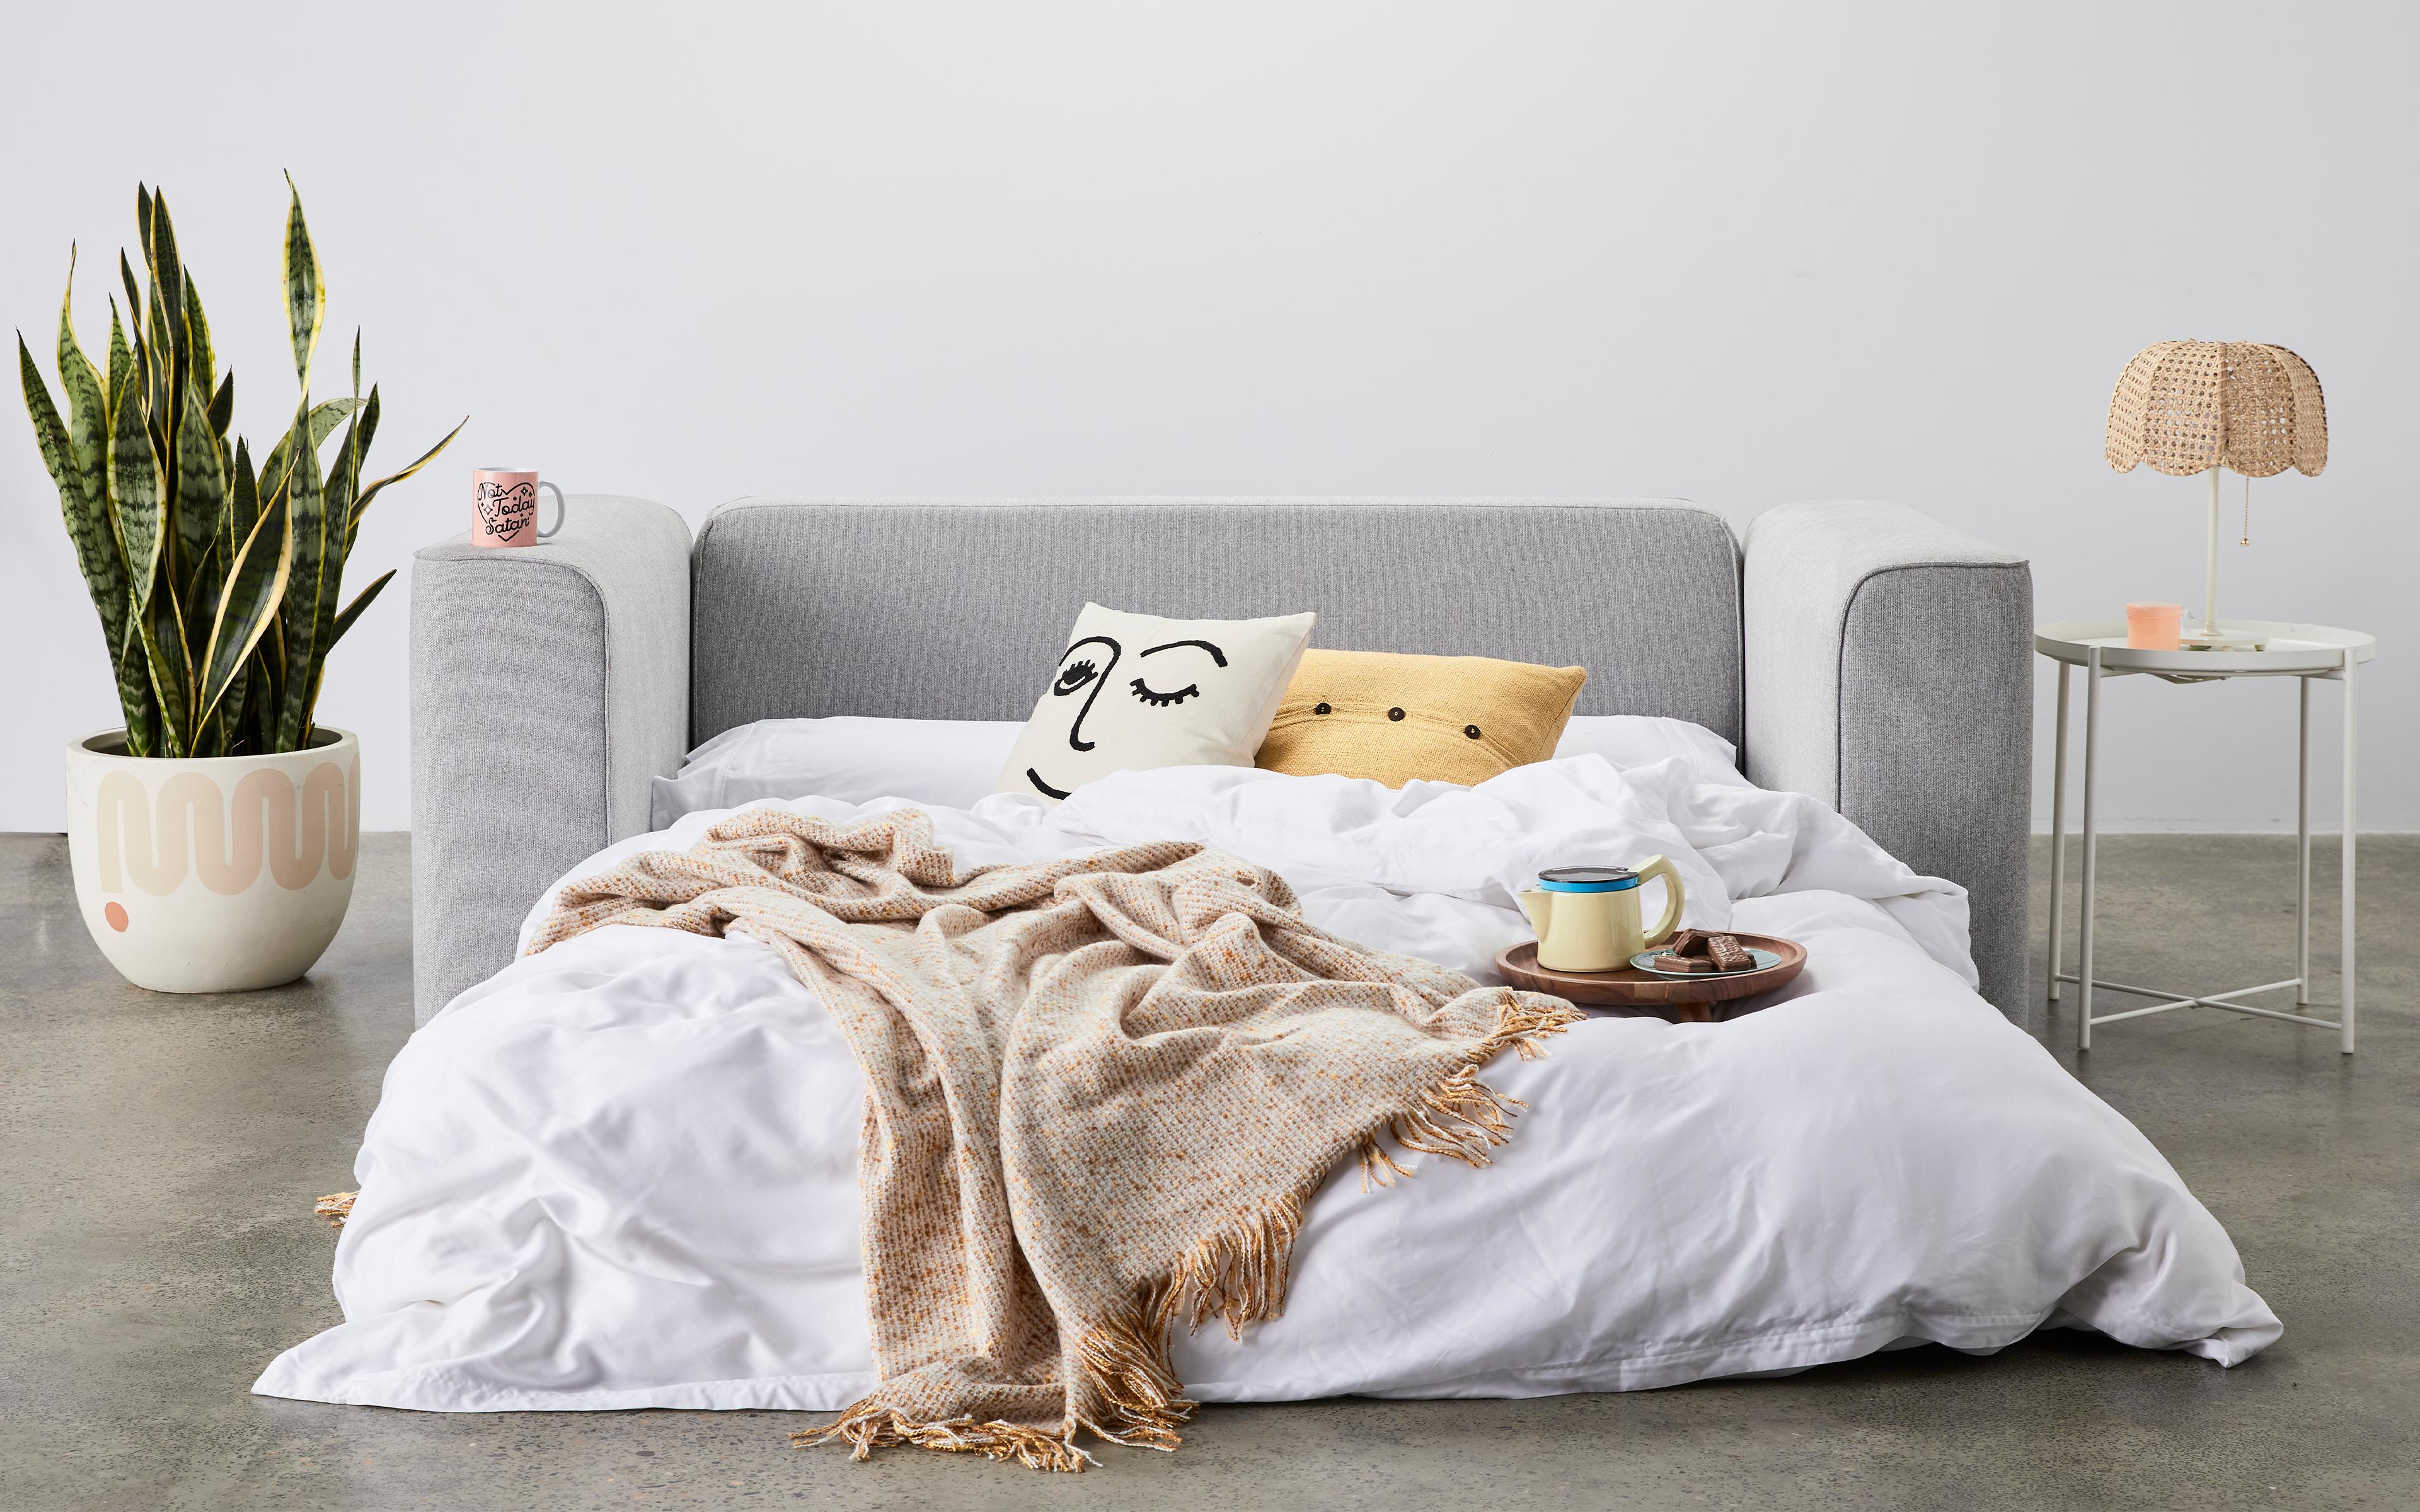 The Koala Sofa Bed Single Double And Queen Sofa Beds With A Koala Mattress Koala